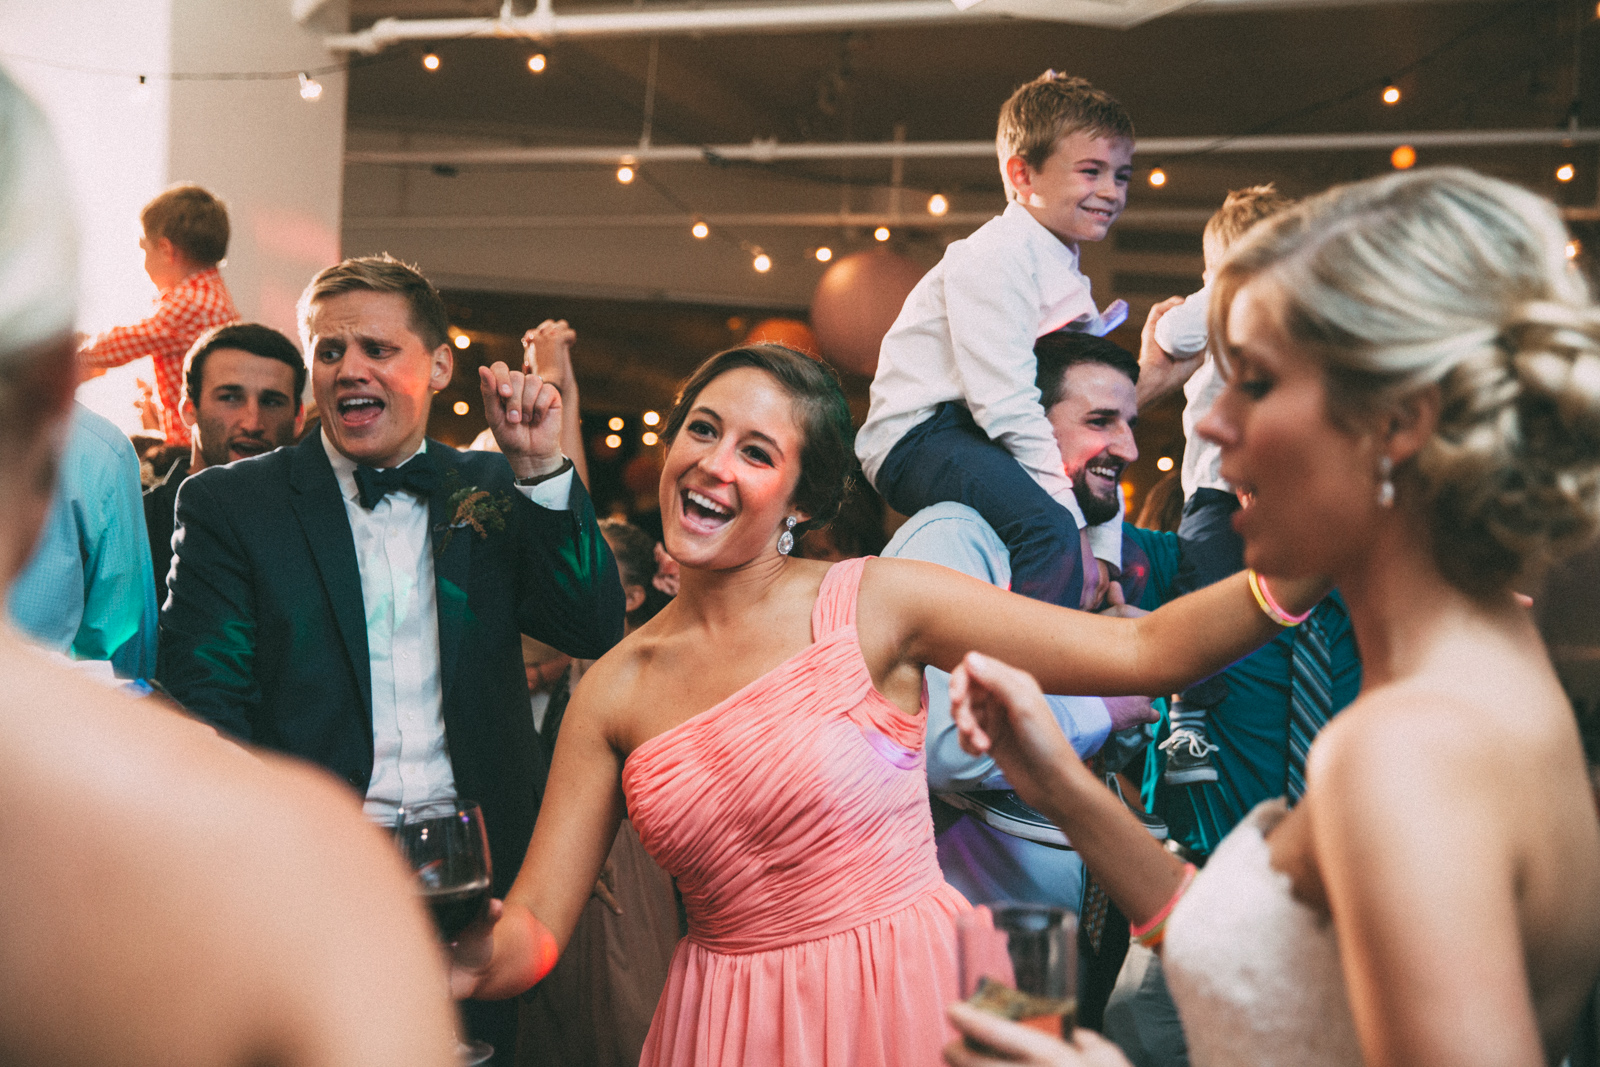 Maid of honor dancing at a wedding reception in Kansas City